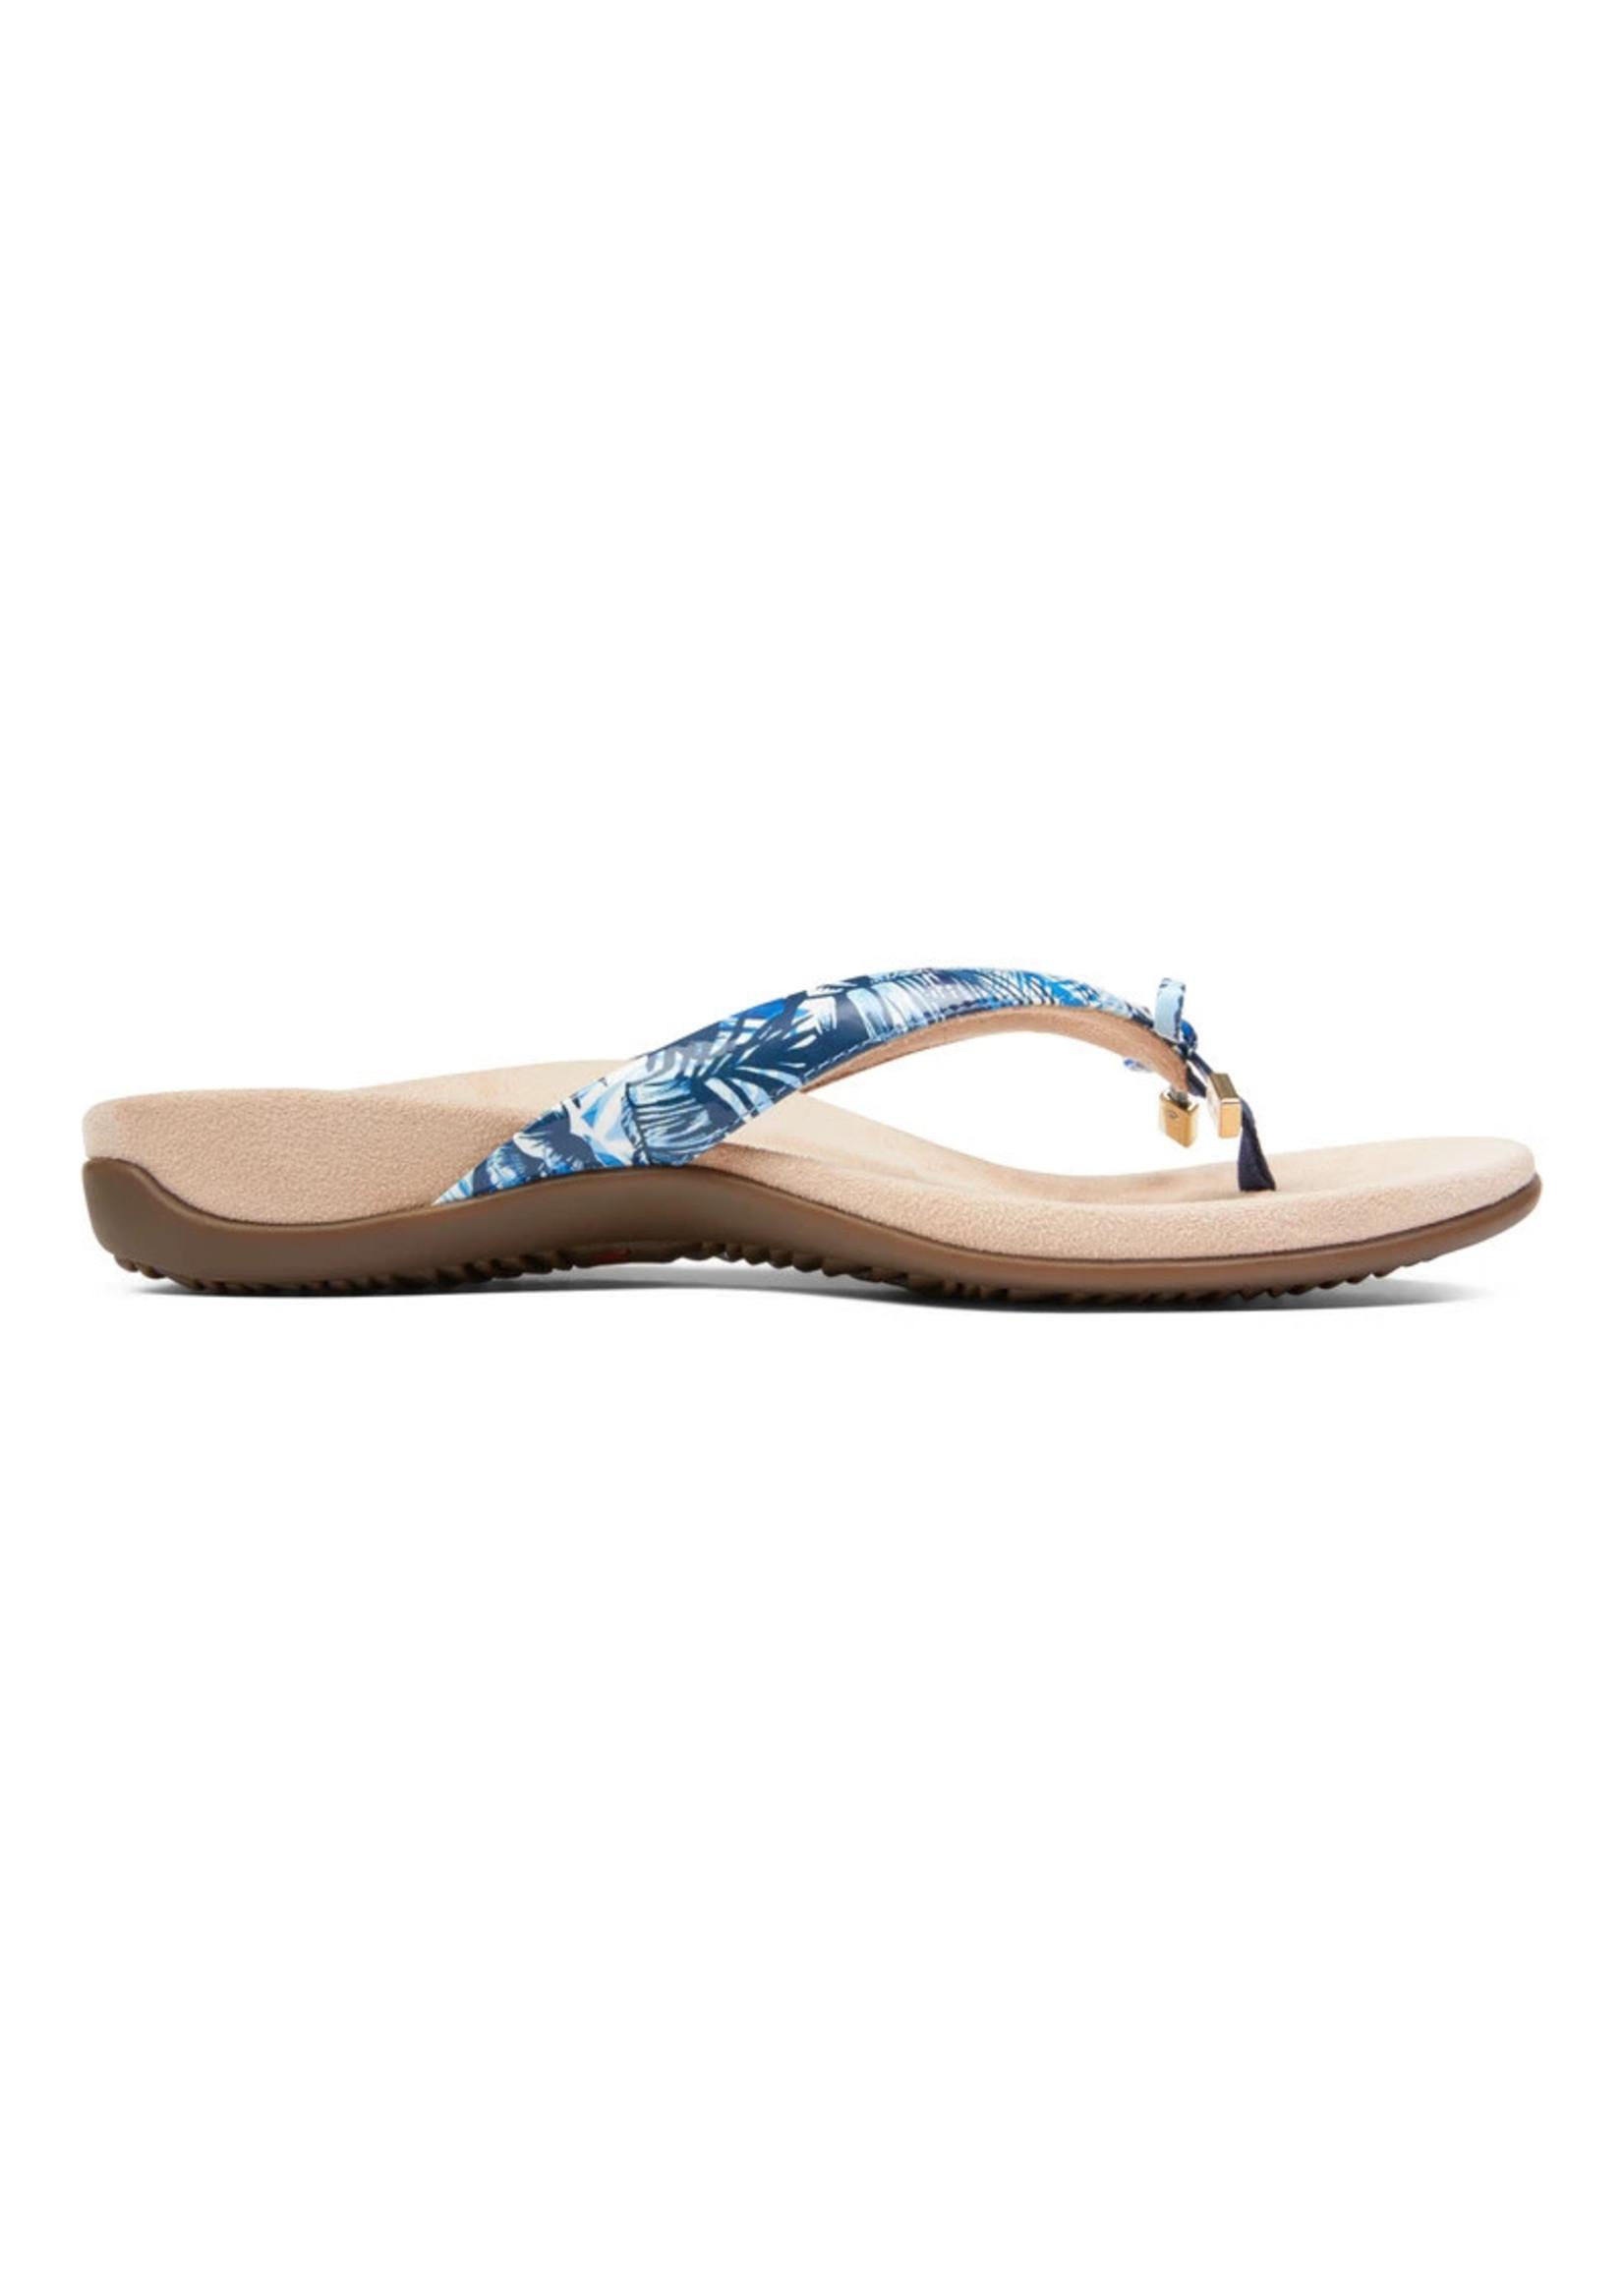 Vionic Bella Toe Post Sandal Blue Palm